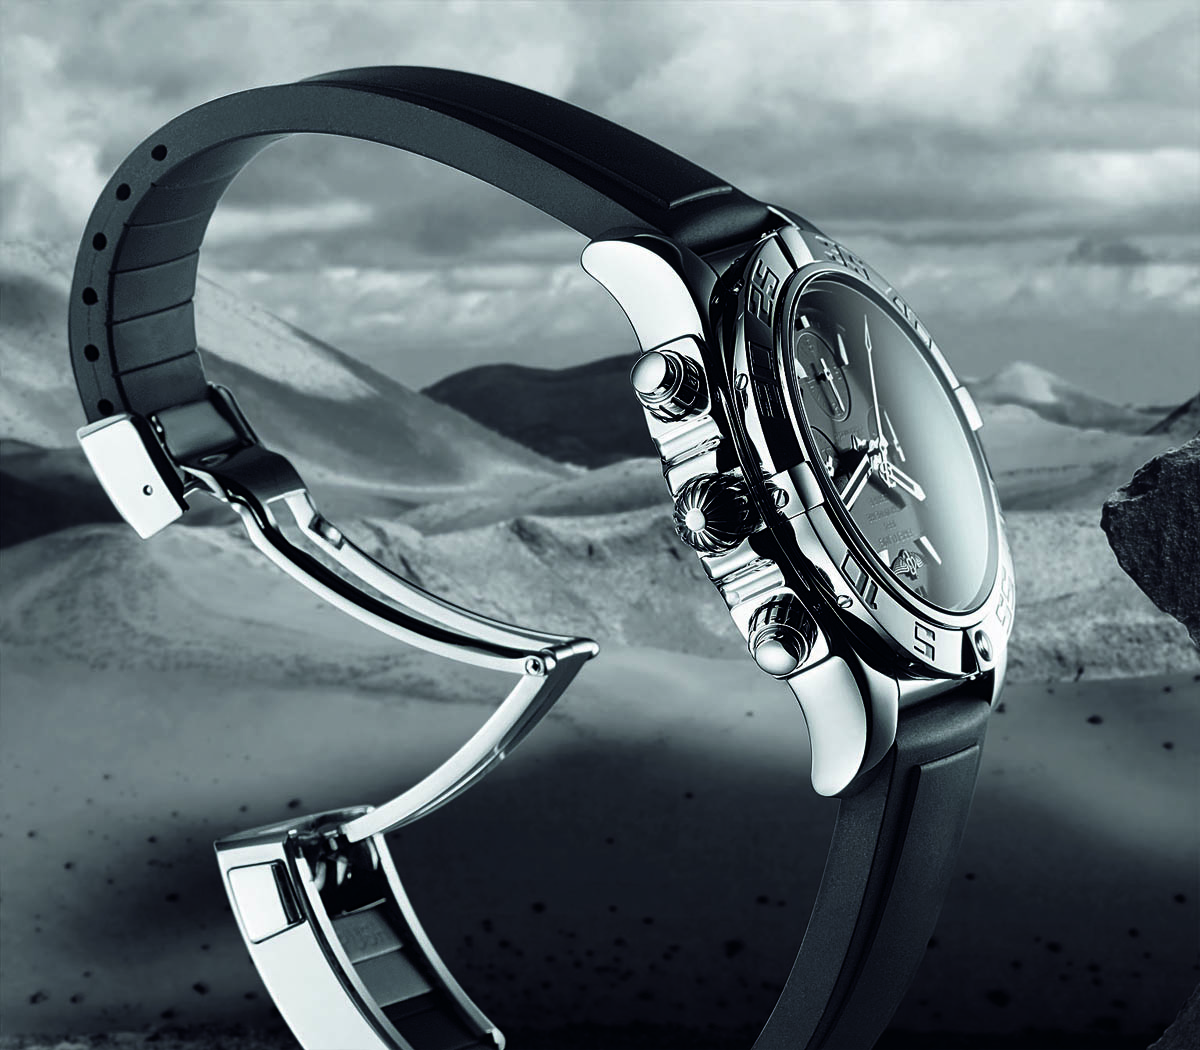 Comparative Review - Breitling Chronomat B01 vs. IWC Ingenieur Chronograph - 5